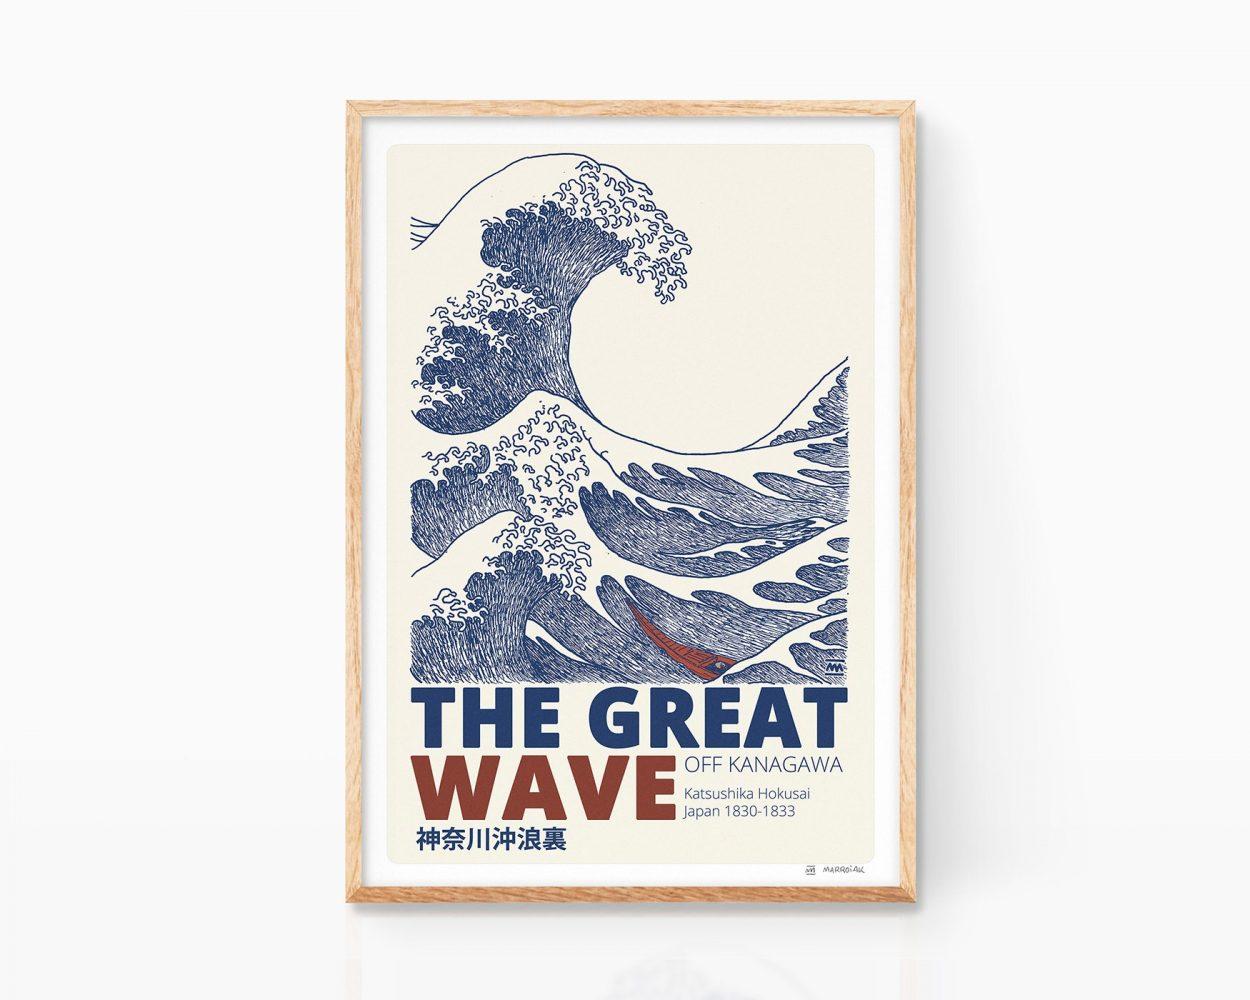 Ukiyo-e drawing print with the great wave off kanagawa by the Japanese artist Katsushika Hokusai. Design and illustration. Japanese Print